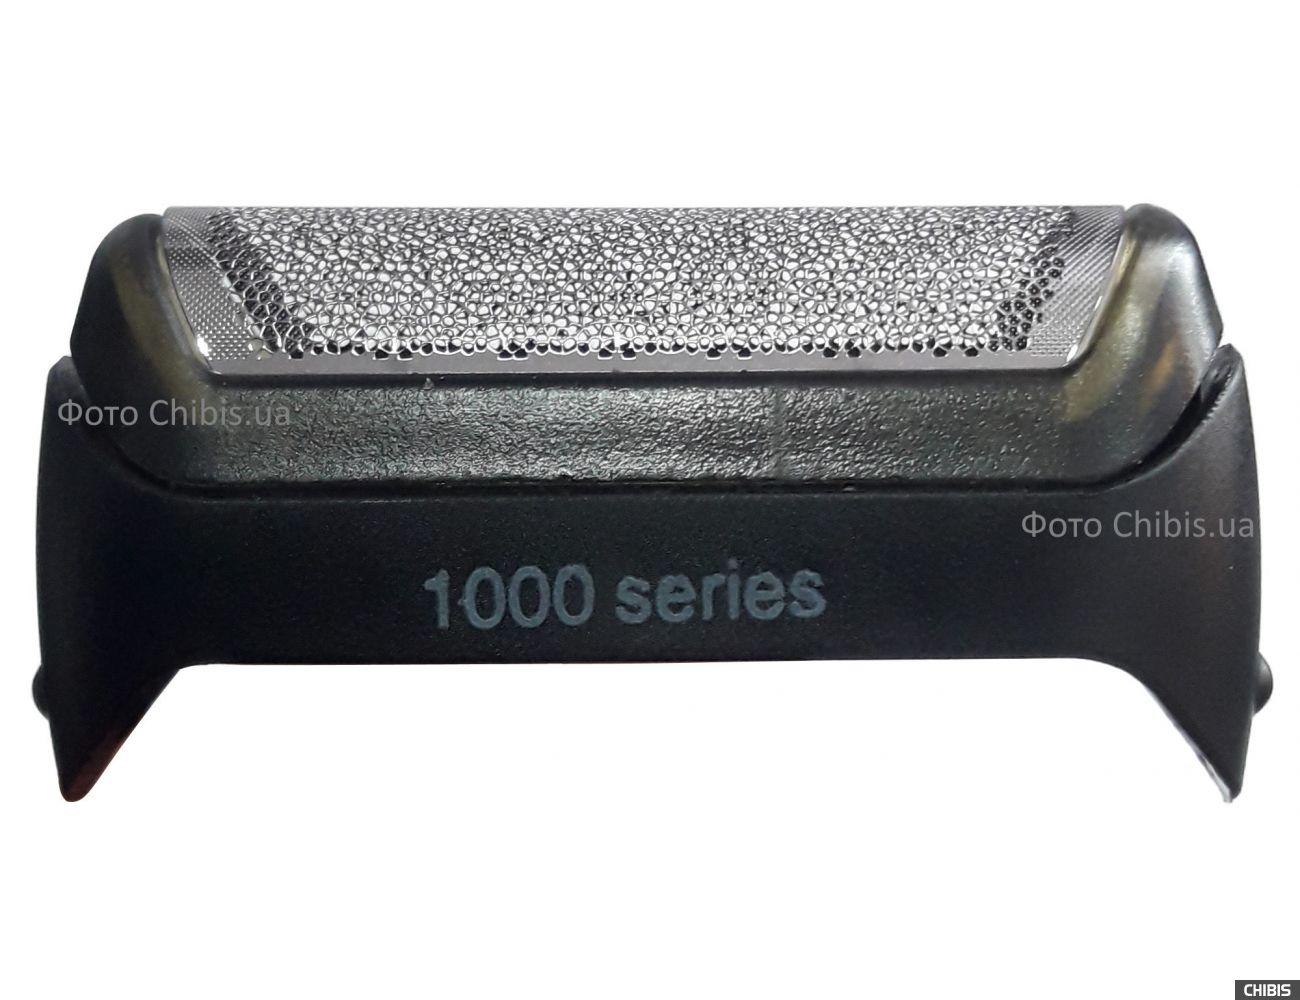 Сетка для бритв Браун серии 1 Фриконтрол 180,190 и крузер, совместимая